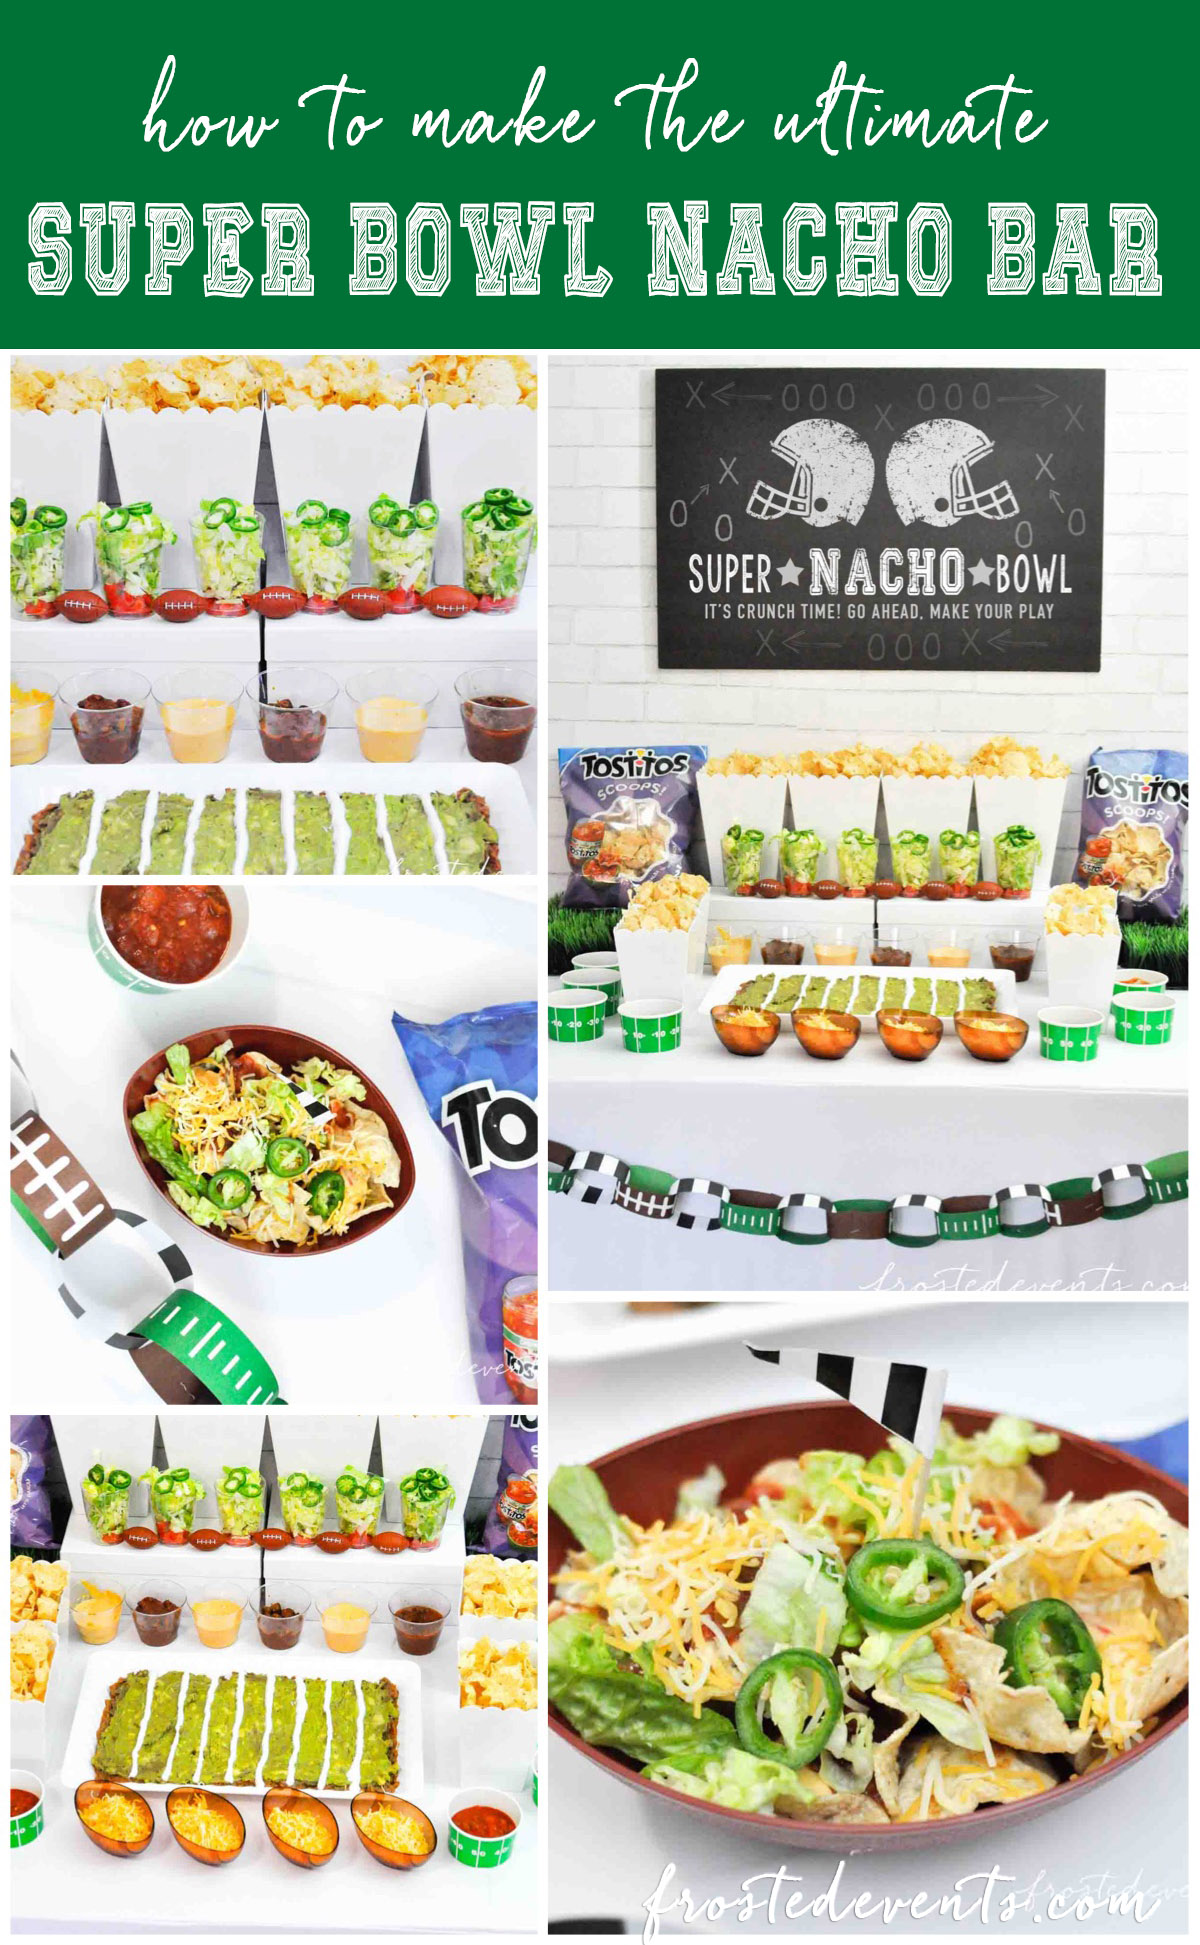 Football Party Ideas Snack Ideas Super Bowl Nacho Bar with Tostitos Food Ideas